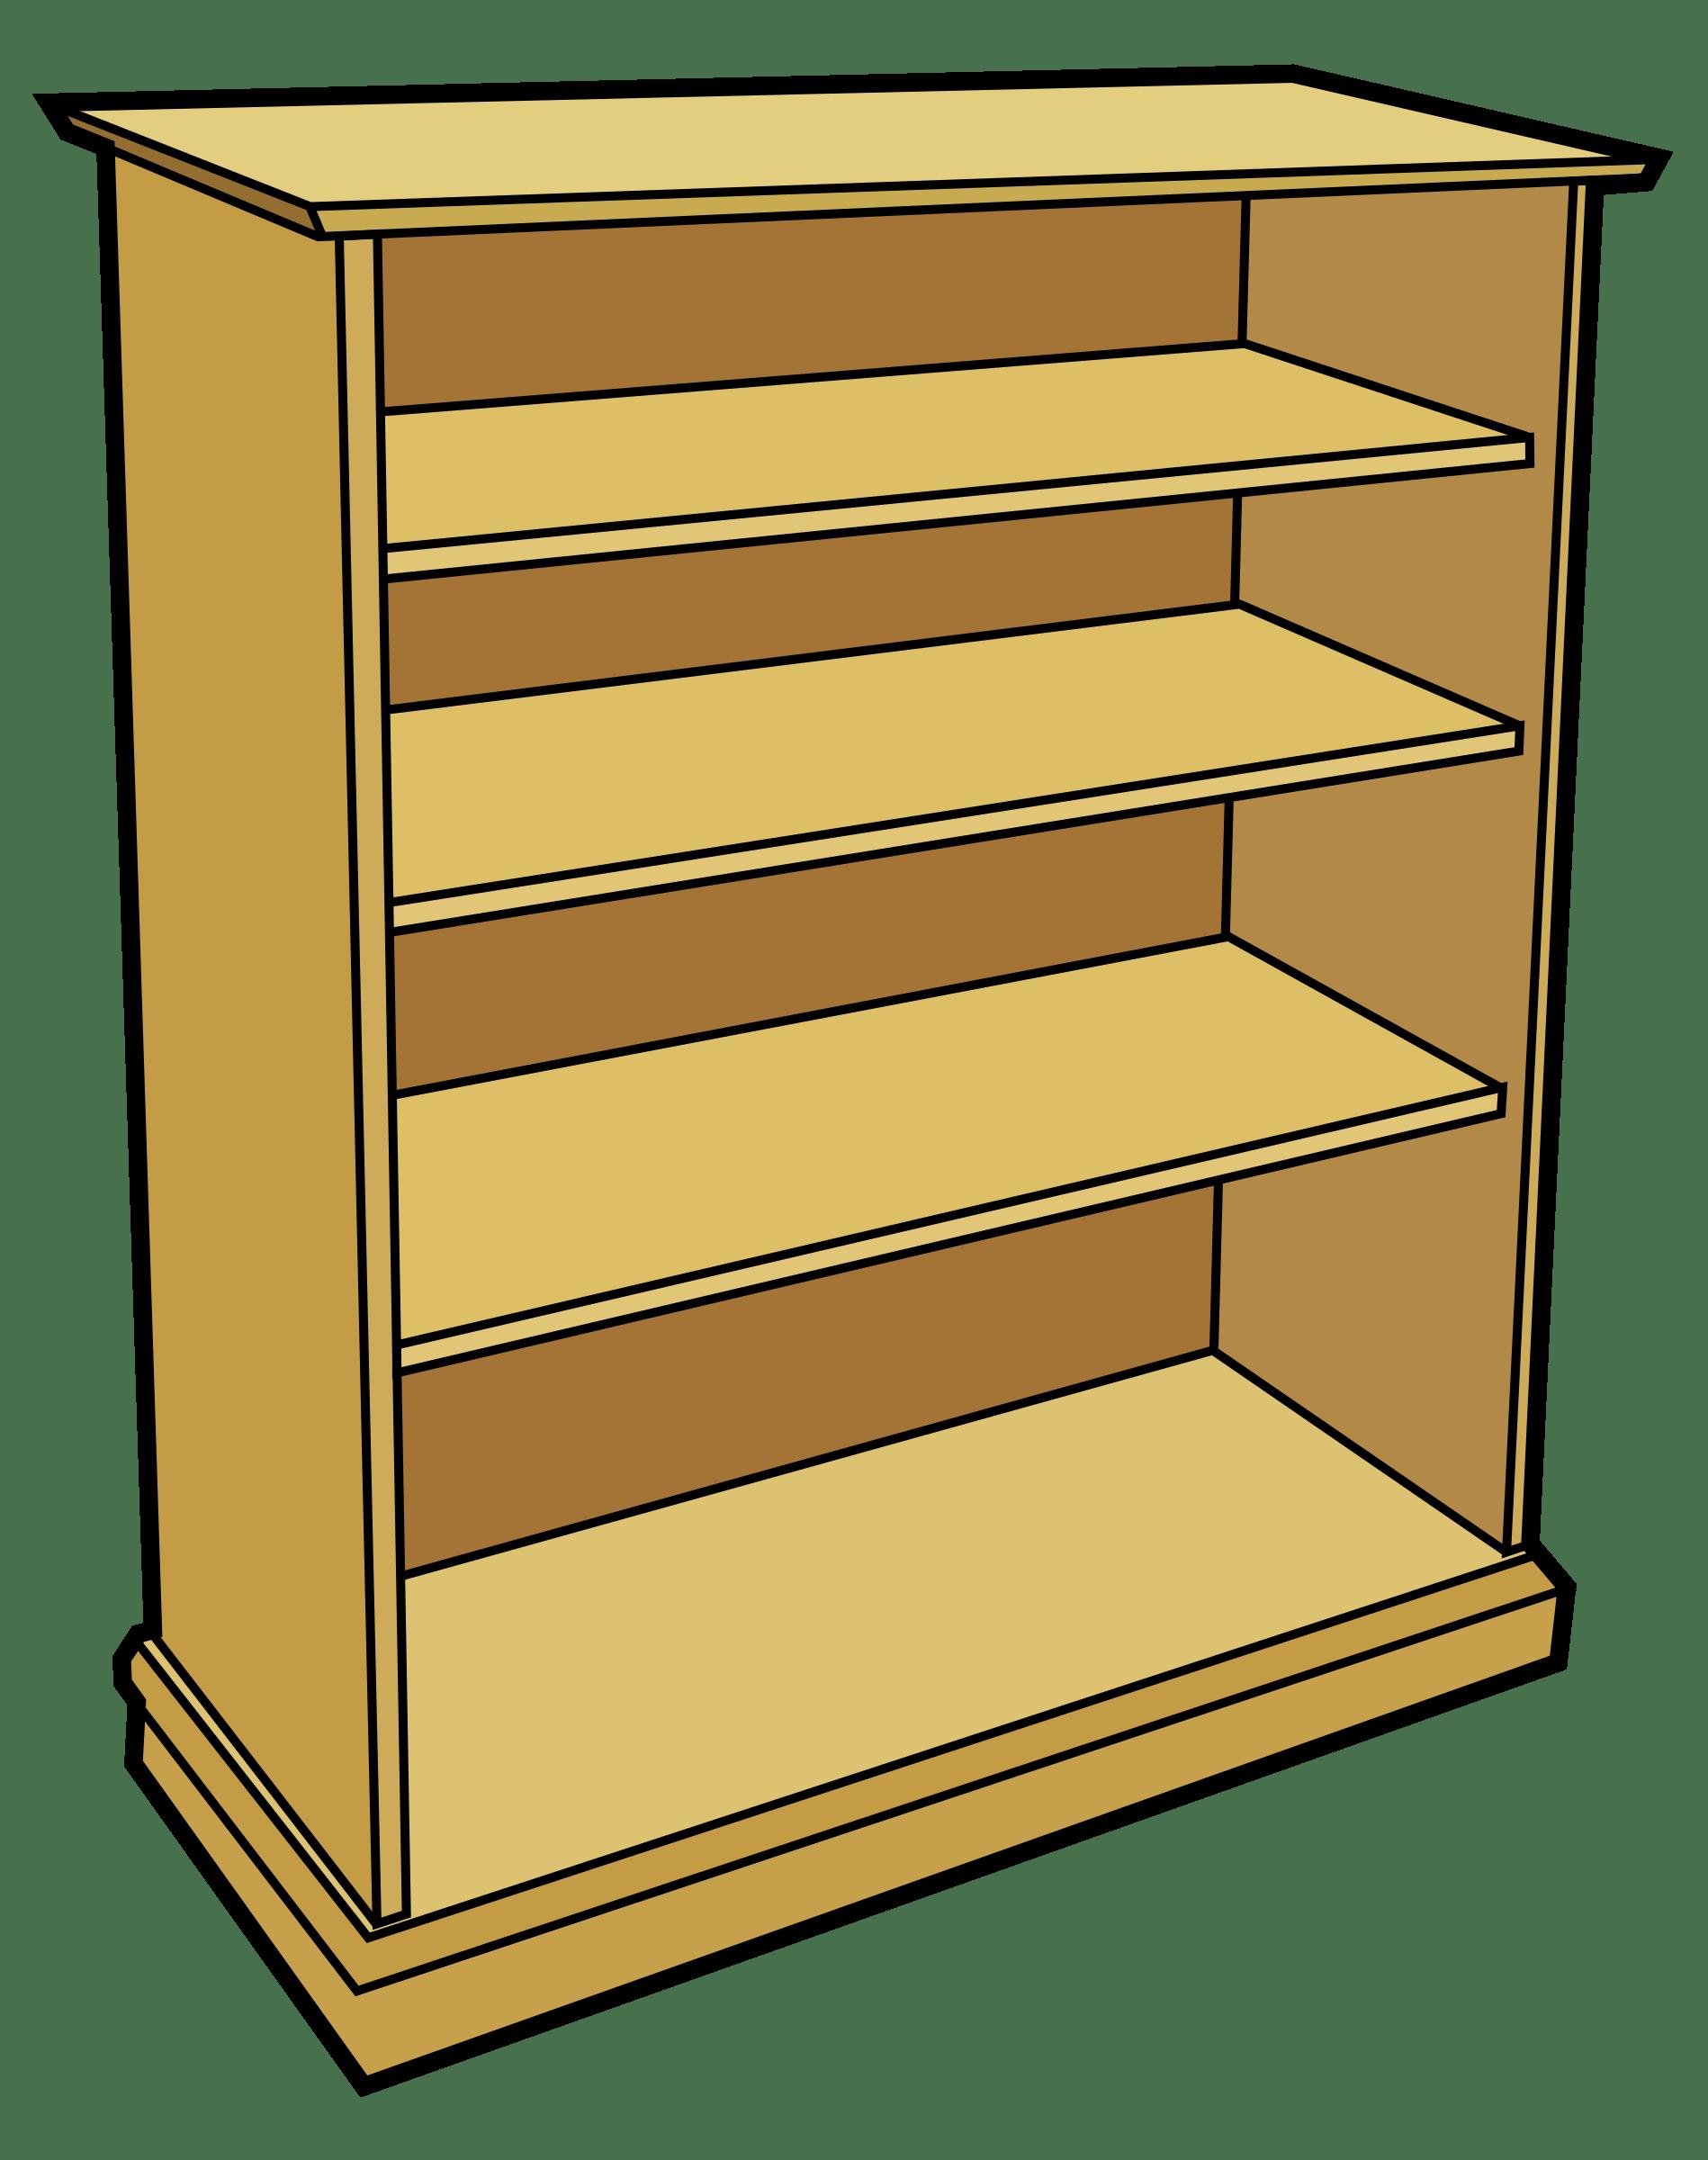 Bookshelf clipart transparent. Bookcase wooden furniture pencil